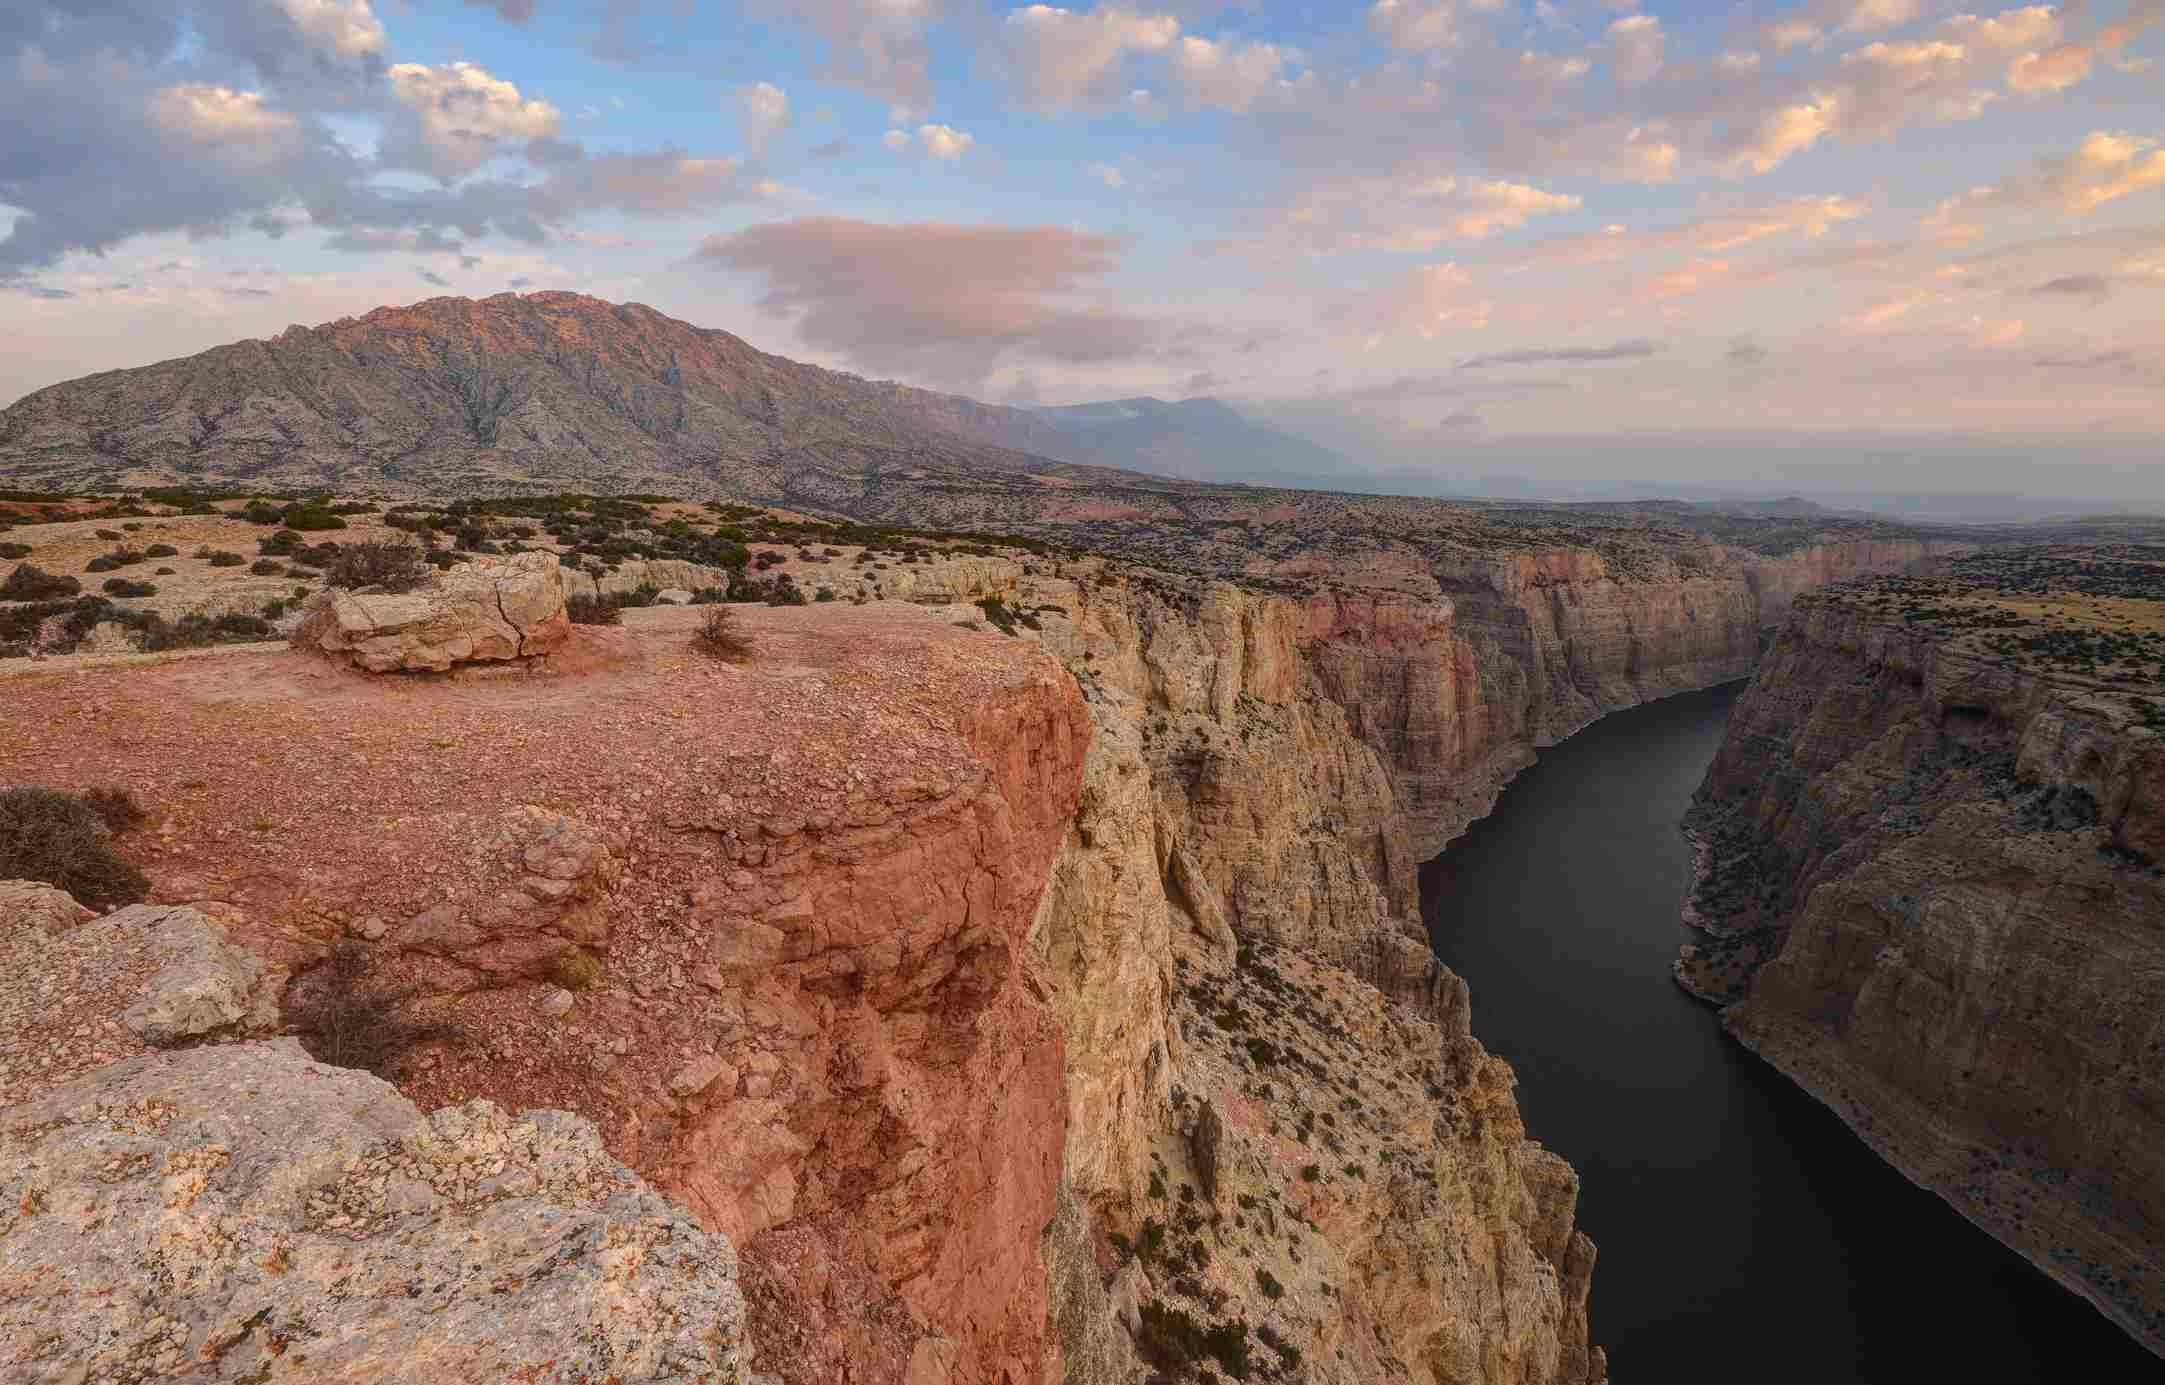 Pryor Mountains and river winding through a canyon, Bighorn Canyon National Recreation Area, Montana, America, USA